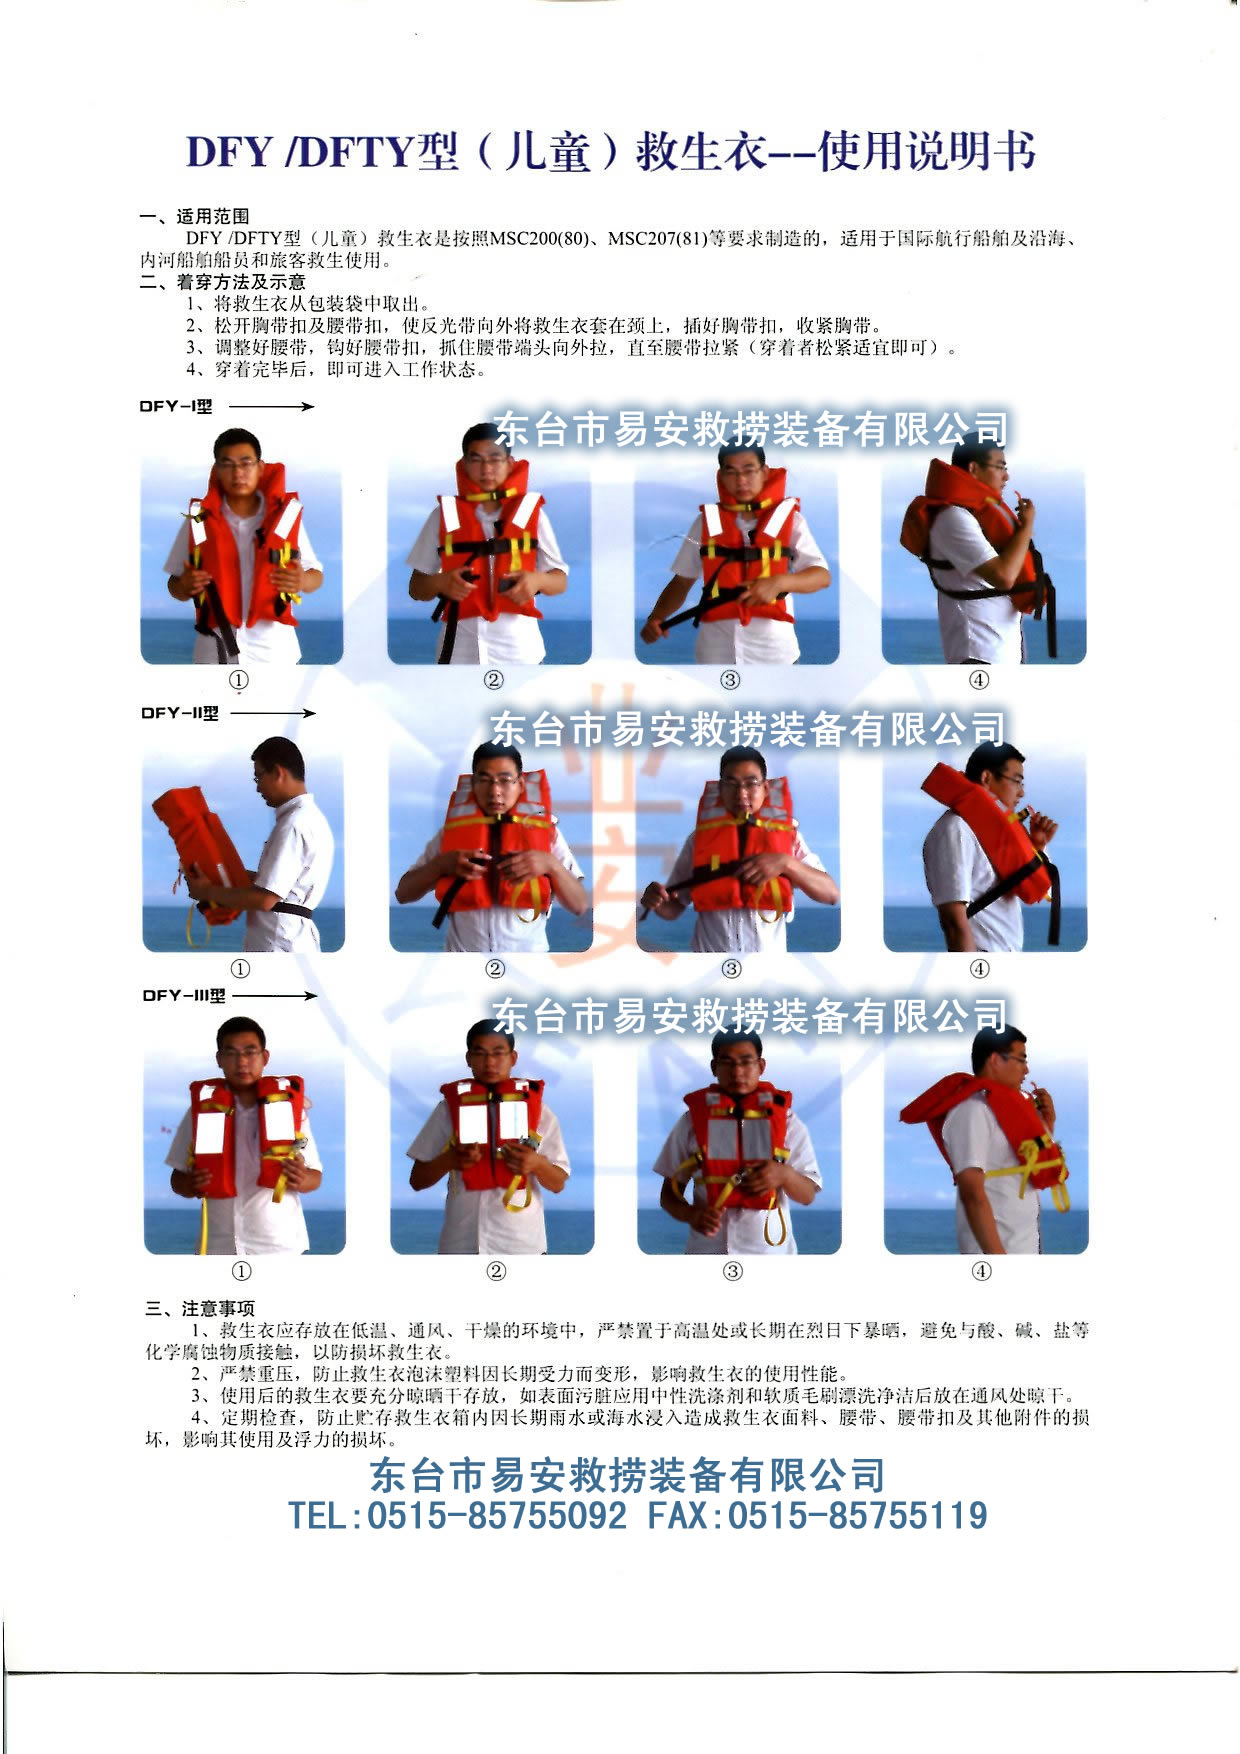 北京pk10赚/i�\y�_dfy-i/ii/iii船用救生衣使用说明及dfty-i儿童救生衣操作示意图